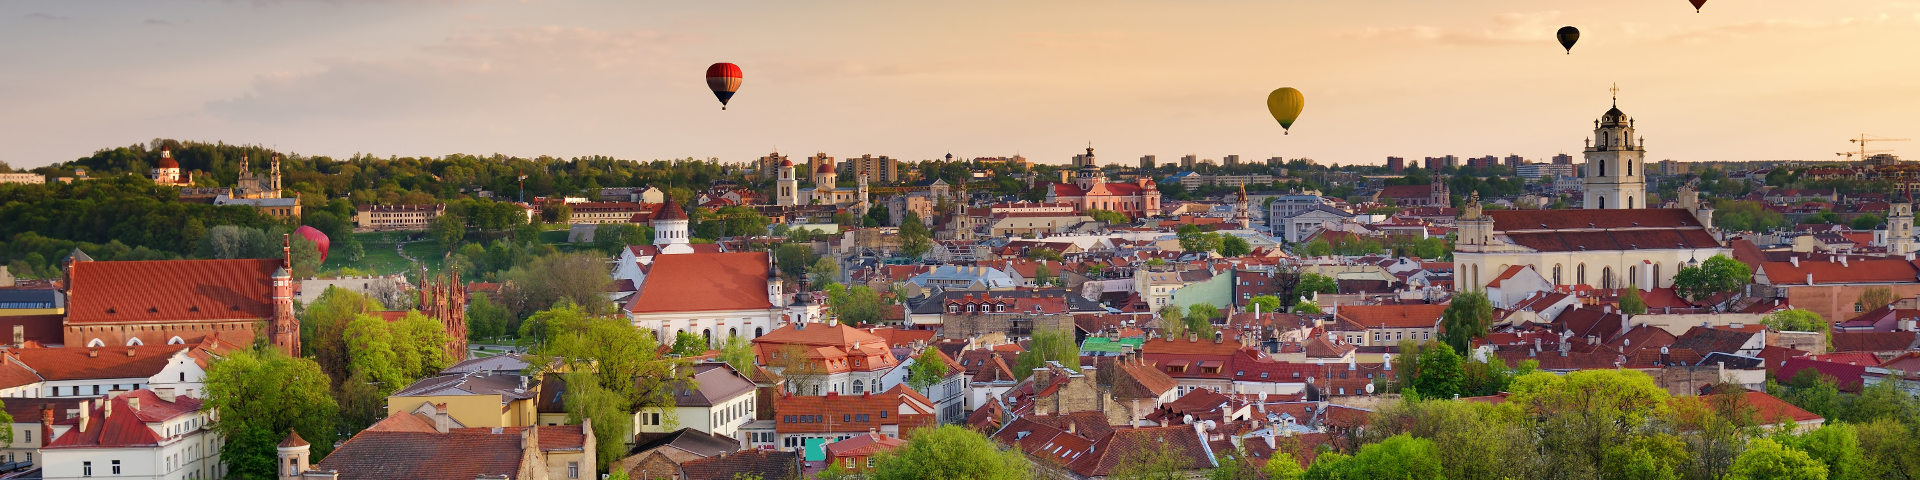 Vilnius hero